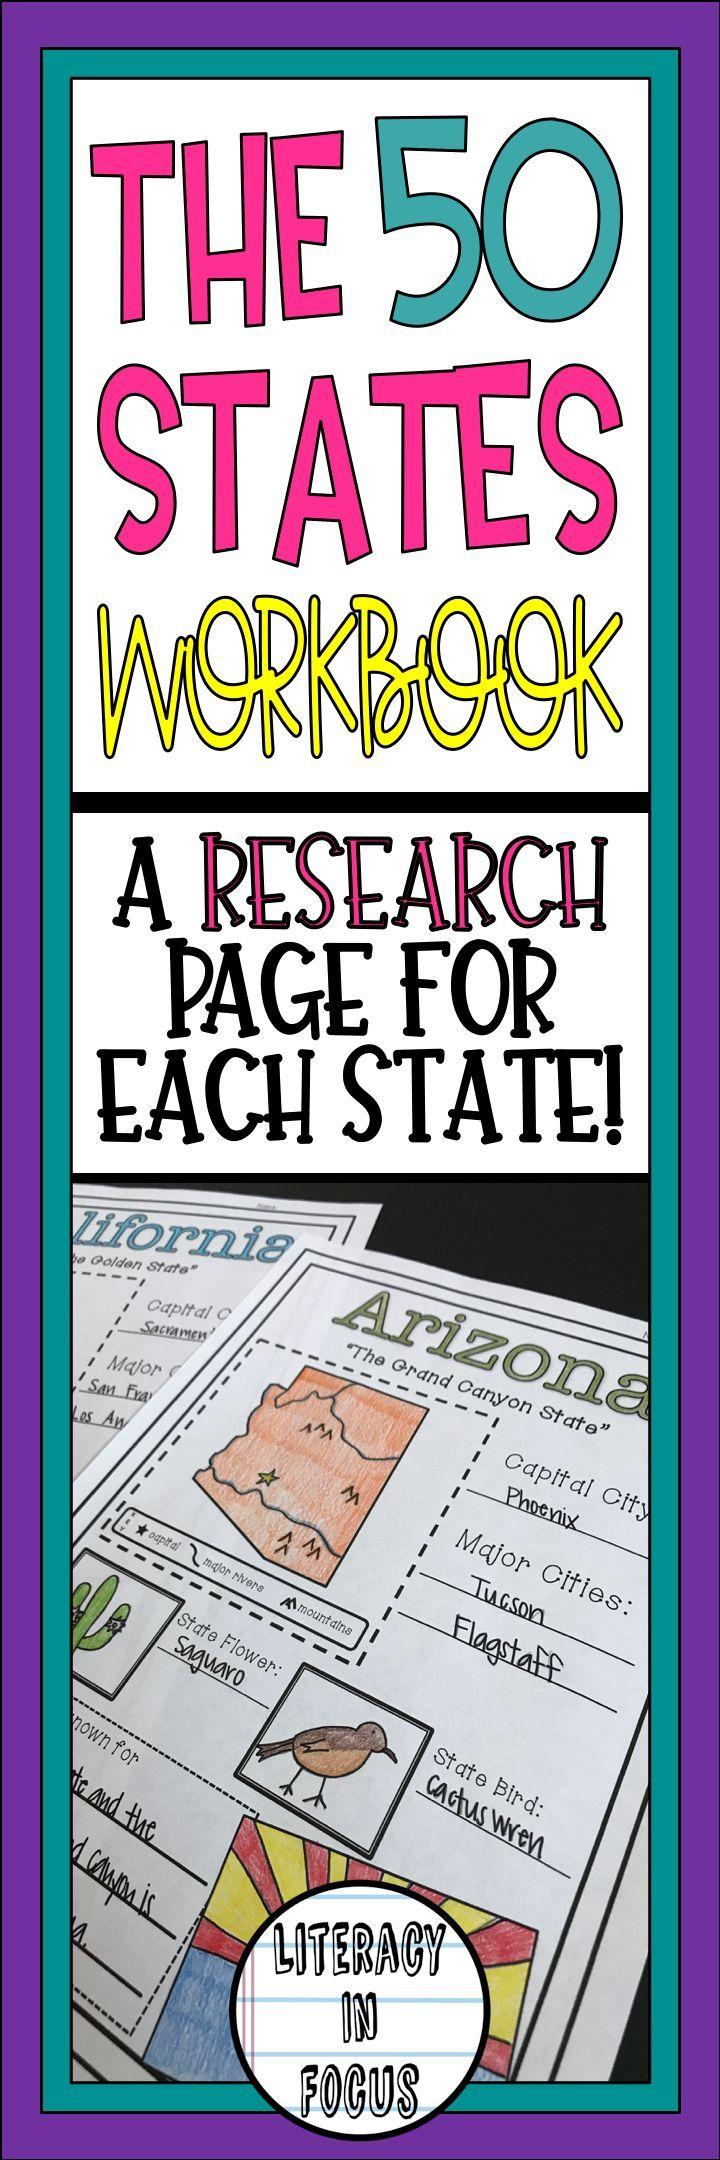 Workbooks golosa workbook : The 50 States Research Workbook